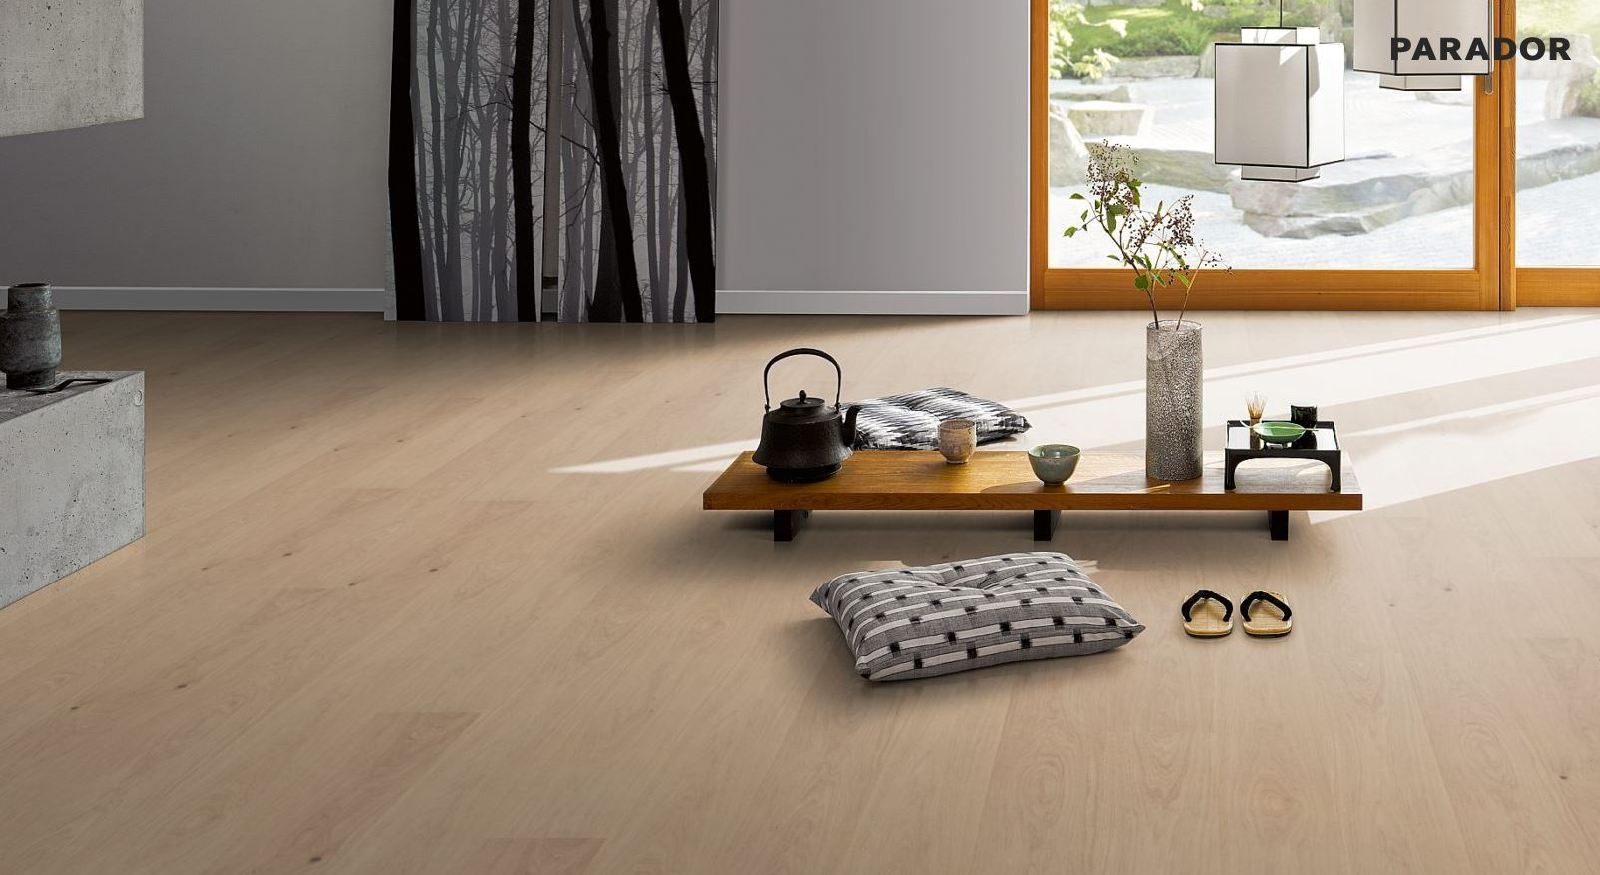 36 95 pro m parador vinylboden modular one mit integriertem kork trittschall ebay. Black Bedroom Furniture Sets. Home Design Ideas